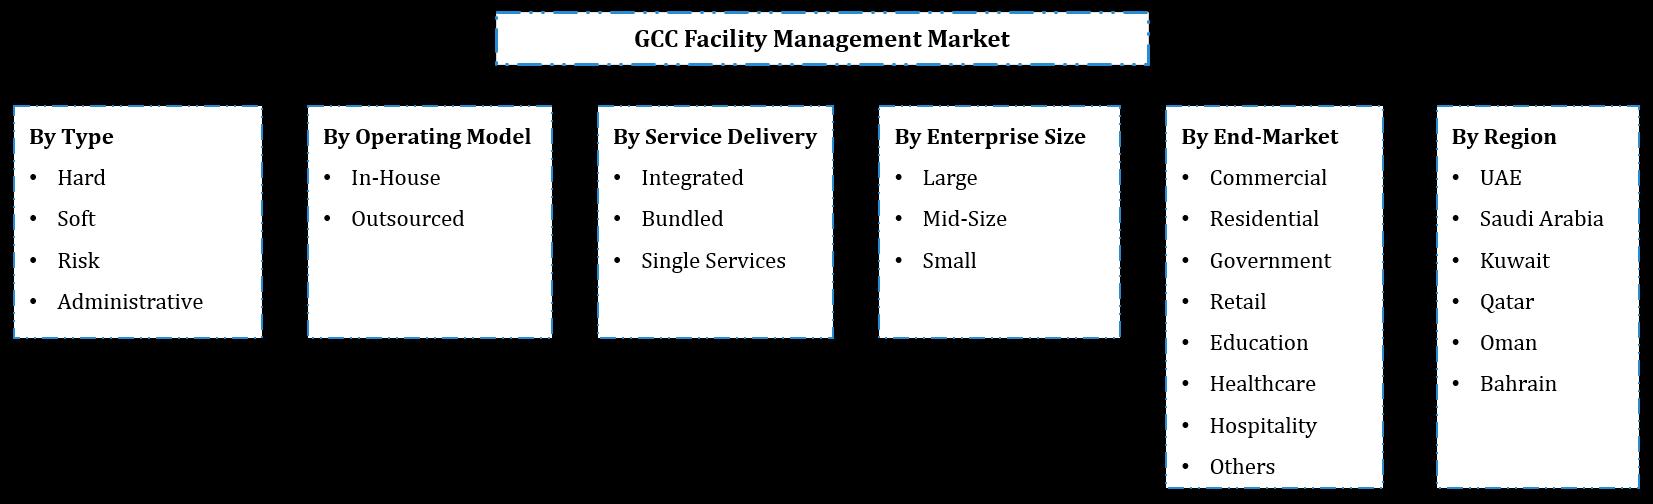 GCC Facility Management Market Segmentation